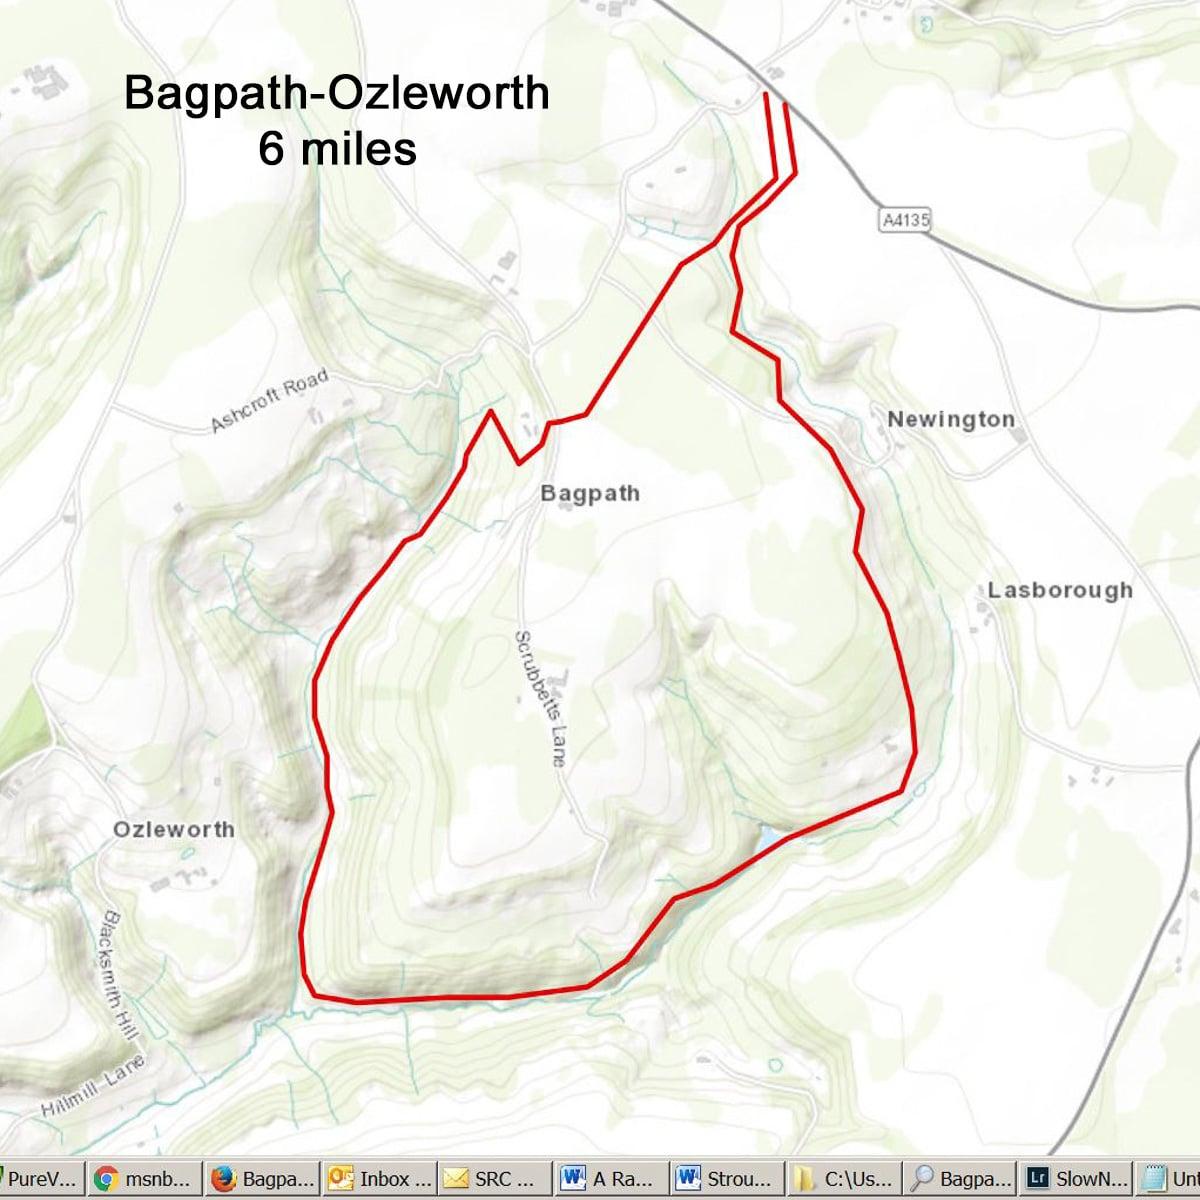 Bagpath-Ozzleworth.jpg